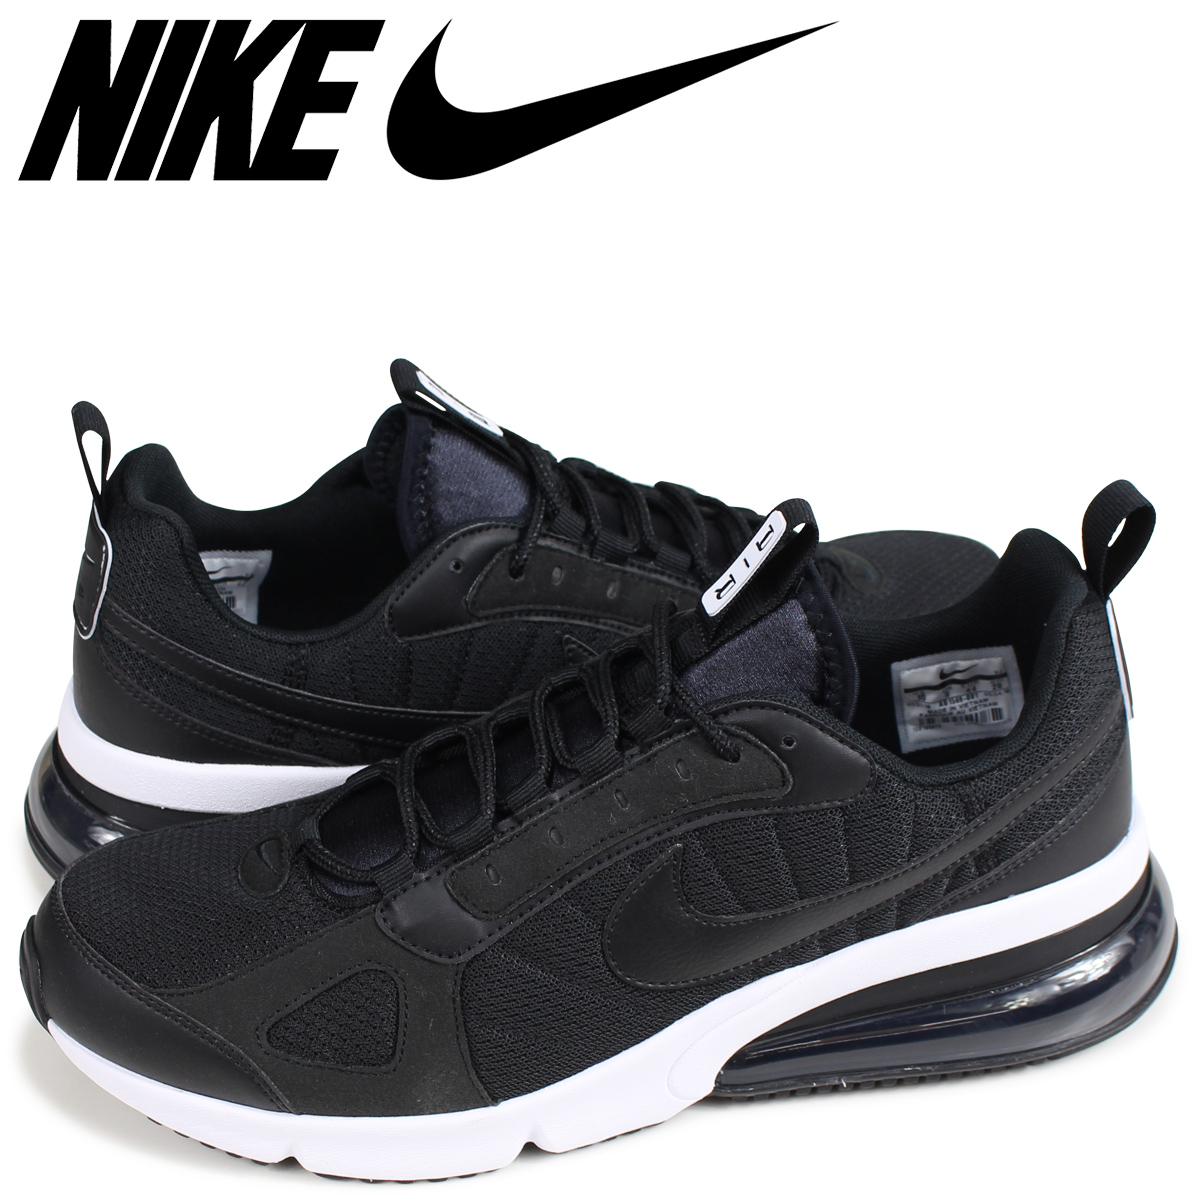 79667288 NIKE AIR MAX 270 FUTURE Kie Ney AMAX 270 sneakers men black AO1569-001 ...